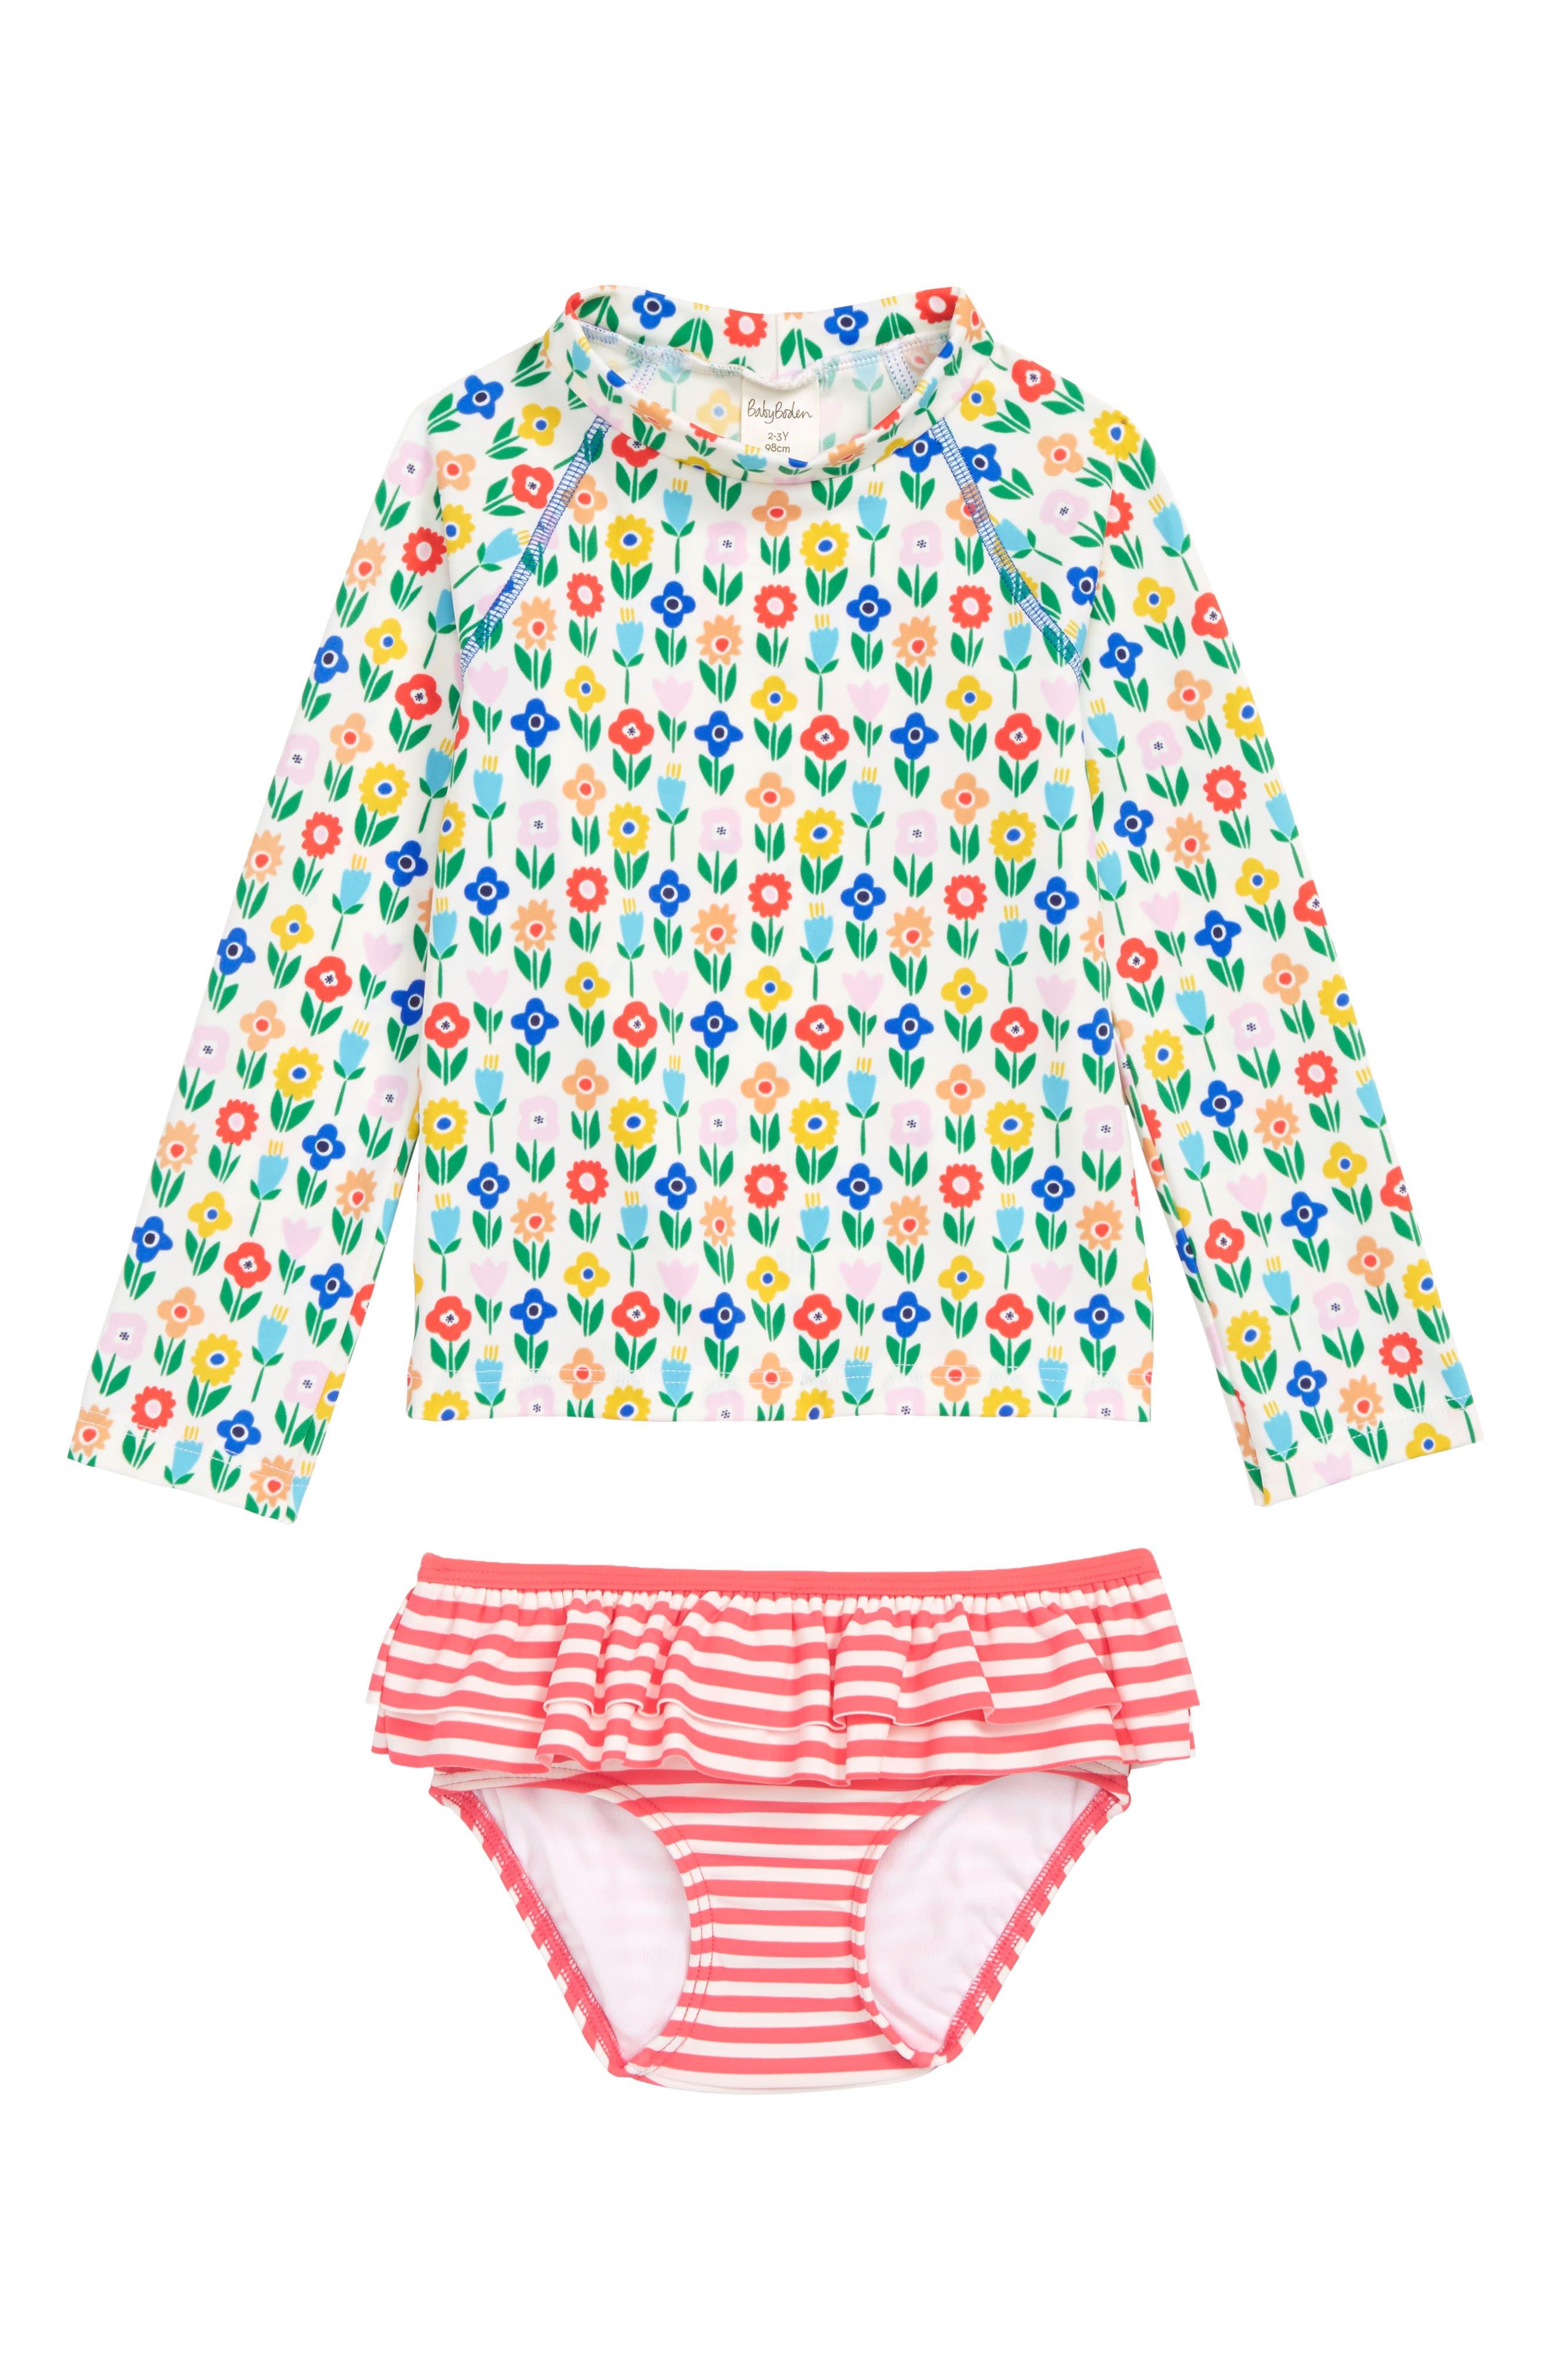 MINI BODEN Two-Piece Rashguard Swimsuit, Main, color, PNT MULTI BABY FLOWER PATCH